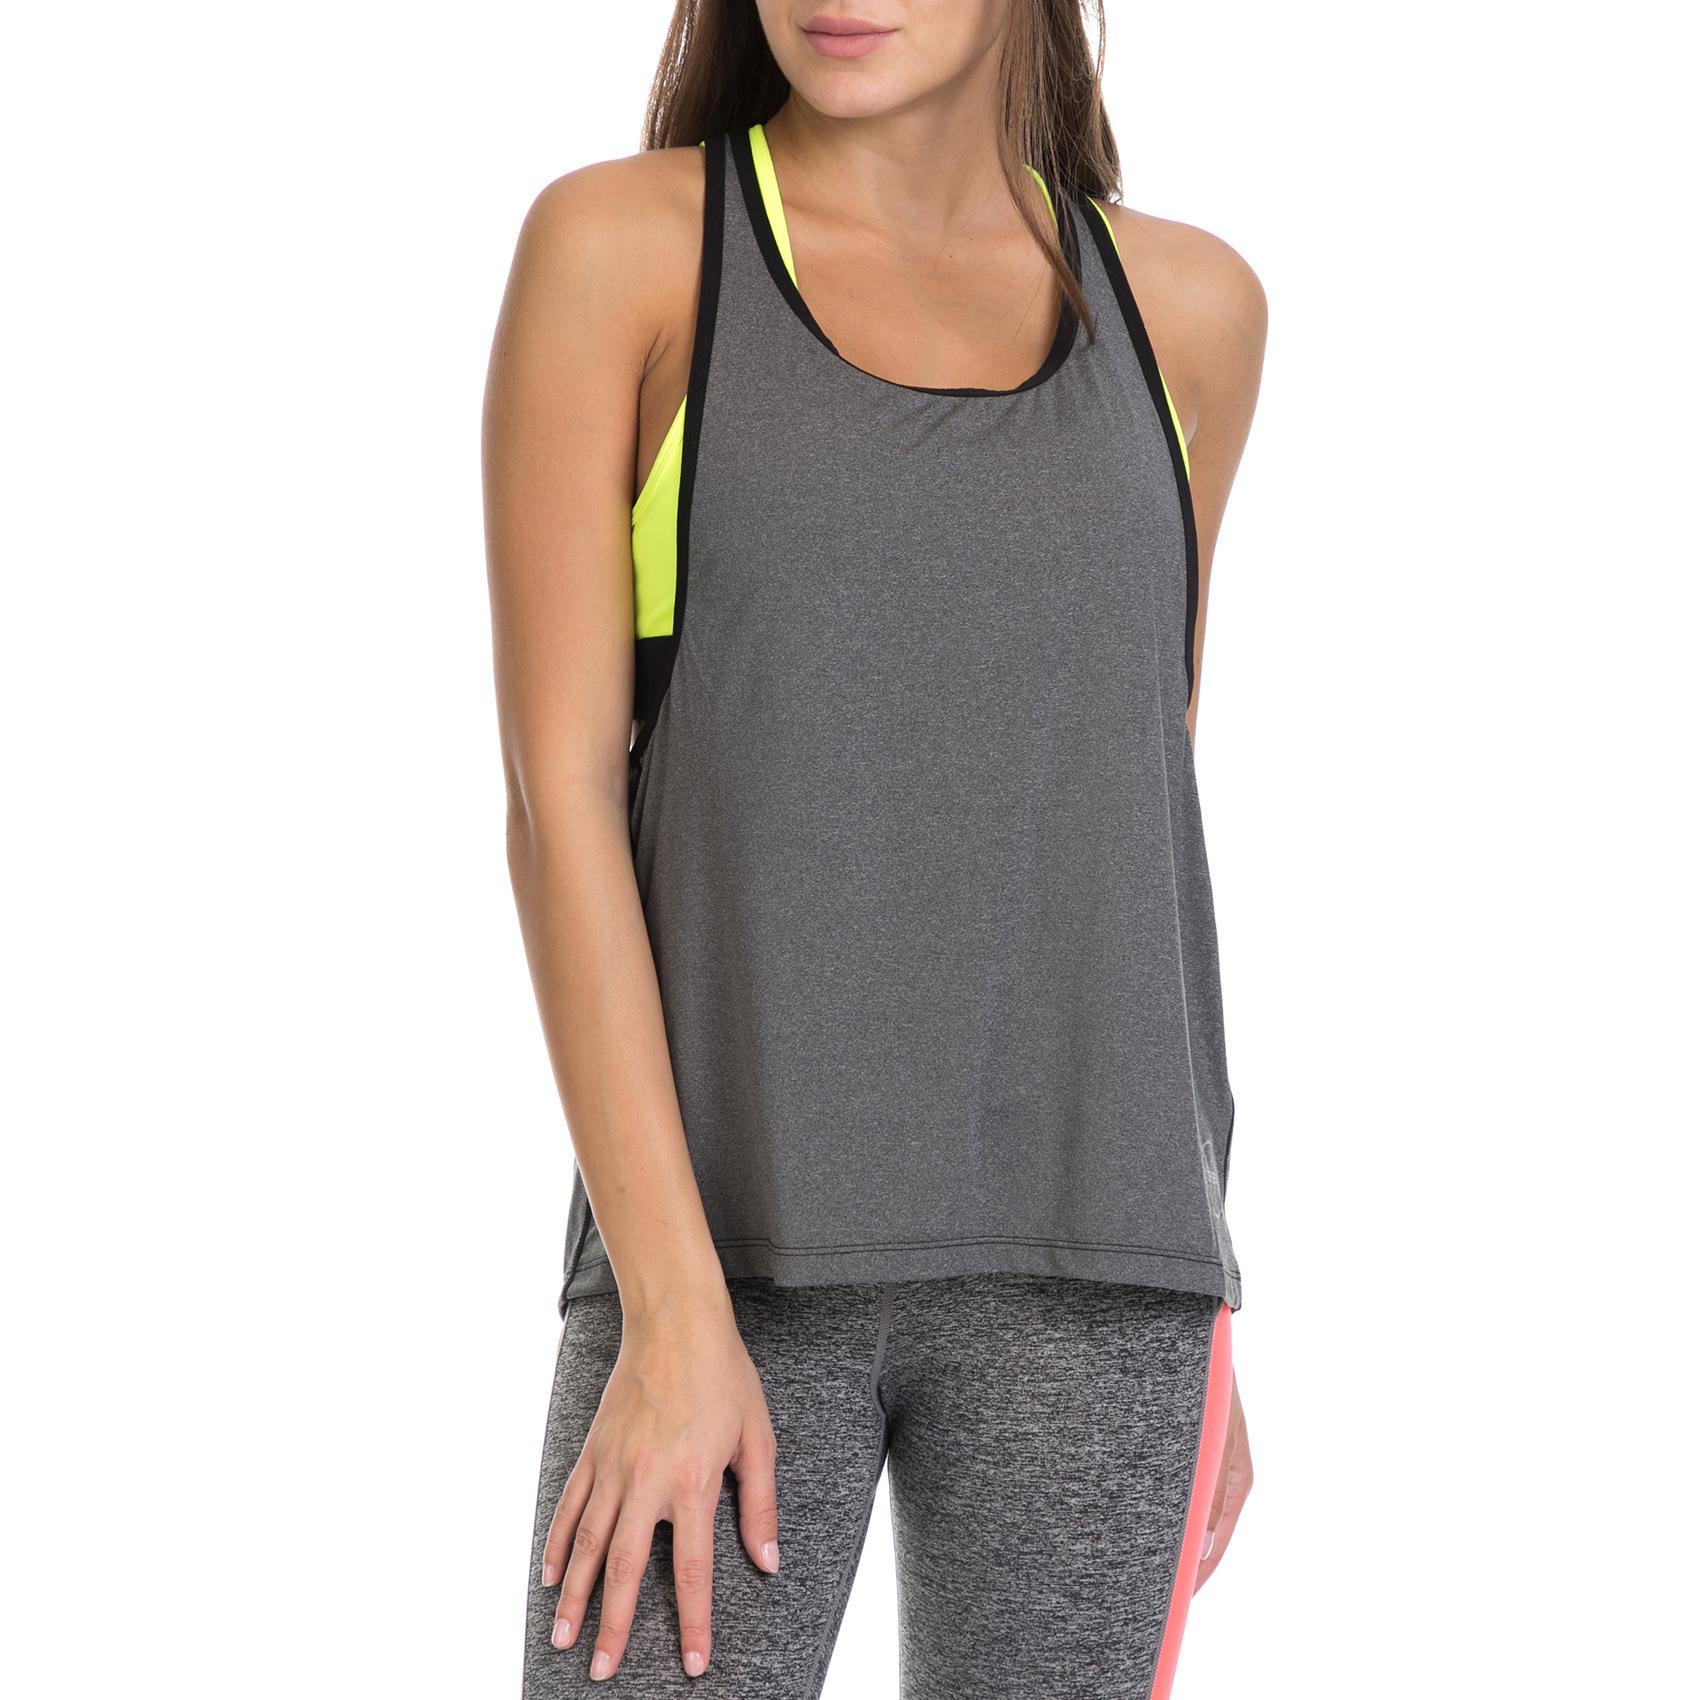 664ad7453a28 GSA – Γυναικεία αθλητική μπλούζα GSA DOUBLE LOOSE TANK TOP T-SHIRT  γκρι-κίτρινη